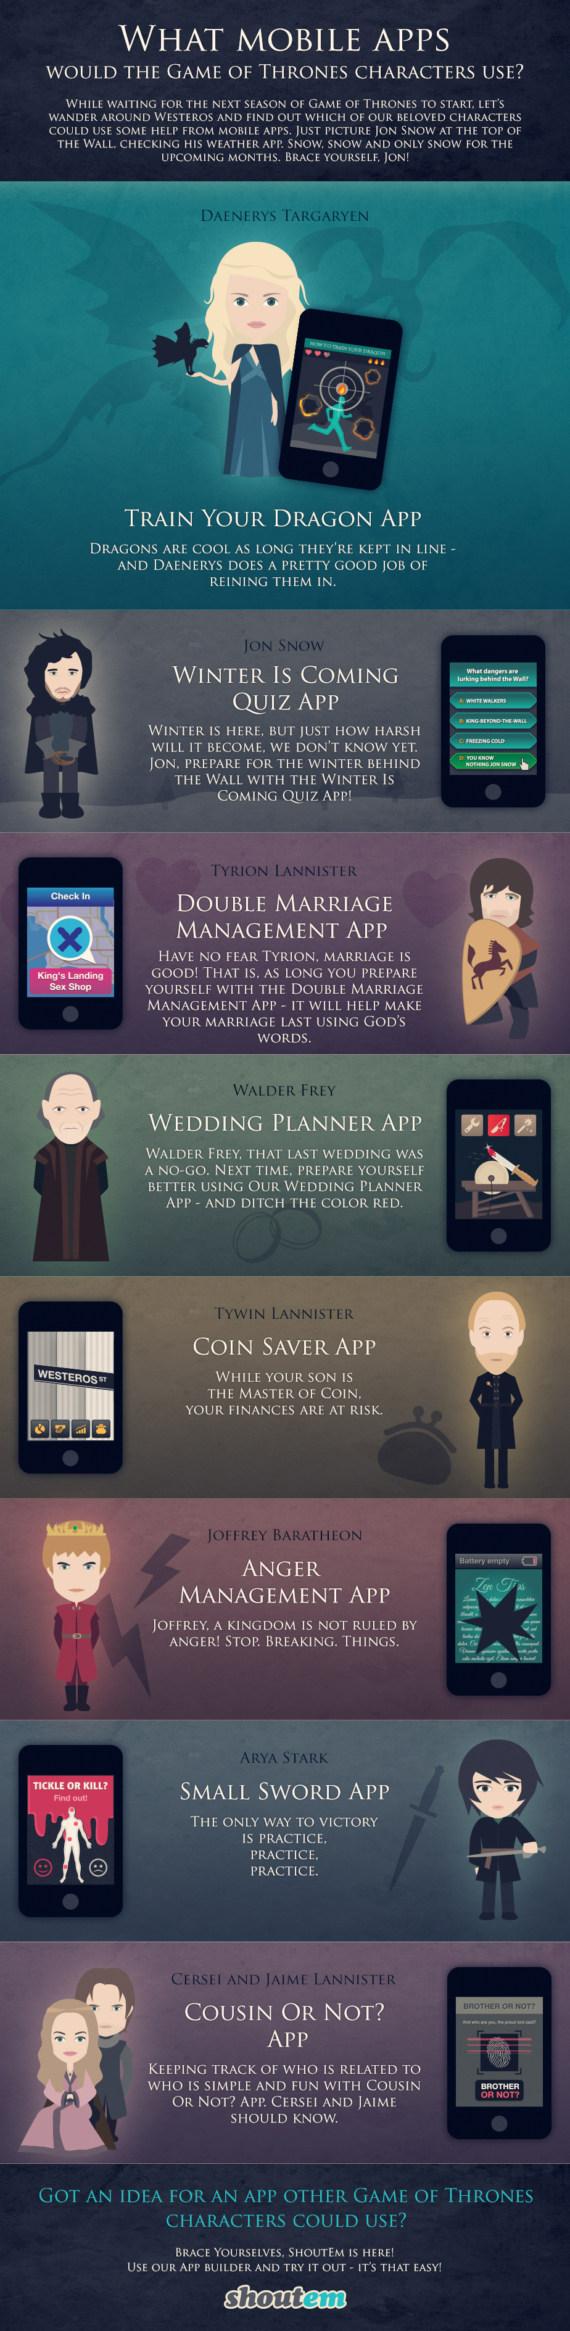 GoT mobile apps